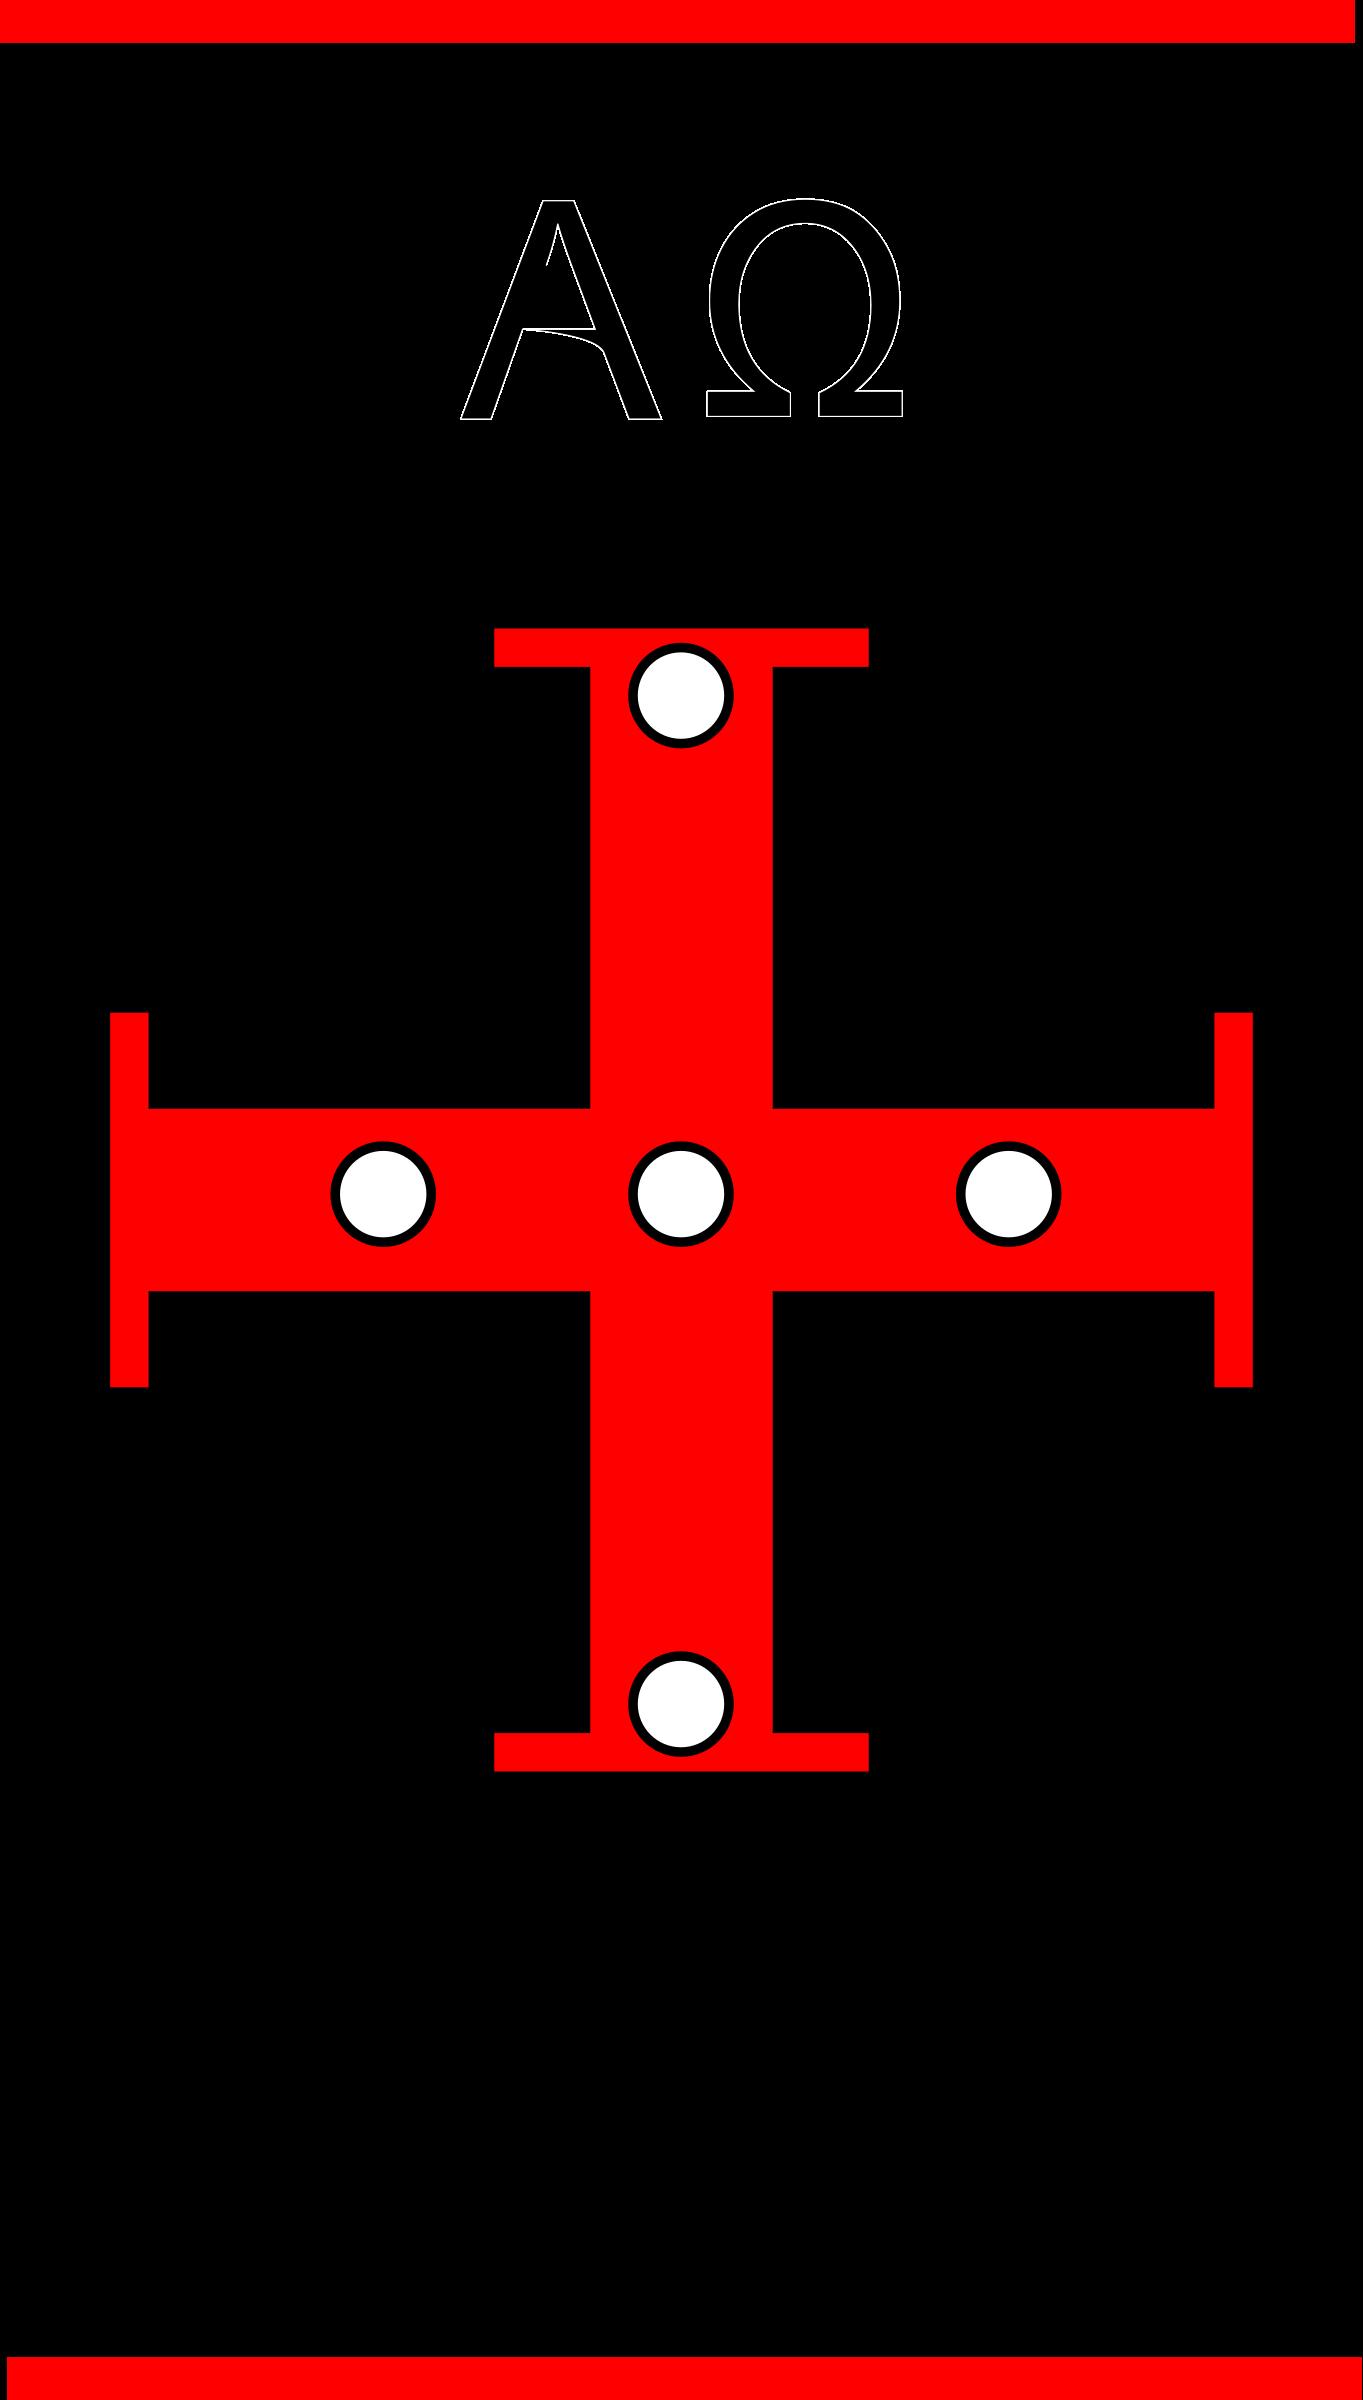 Clipart candle symbol. Paschal symbols big image